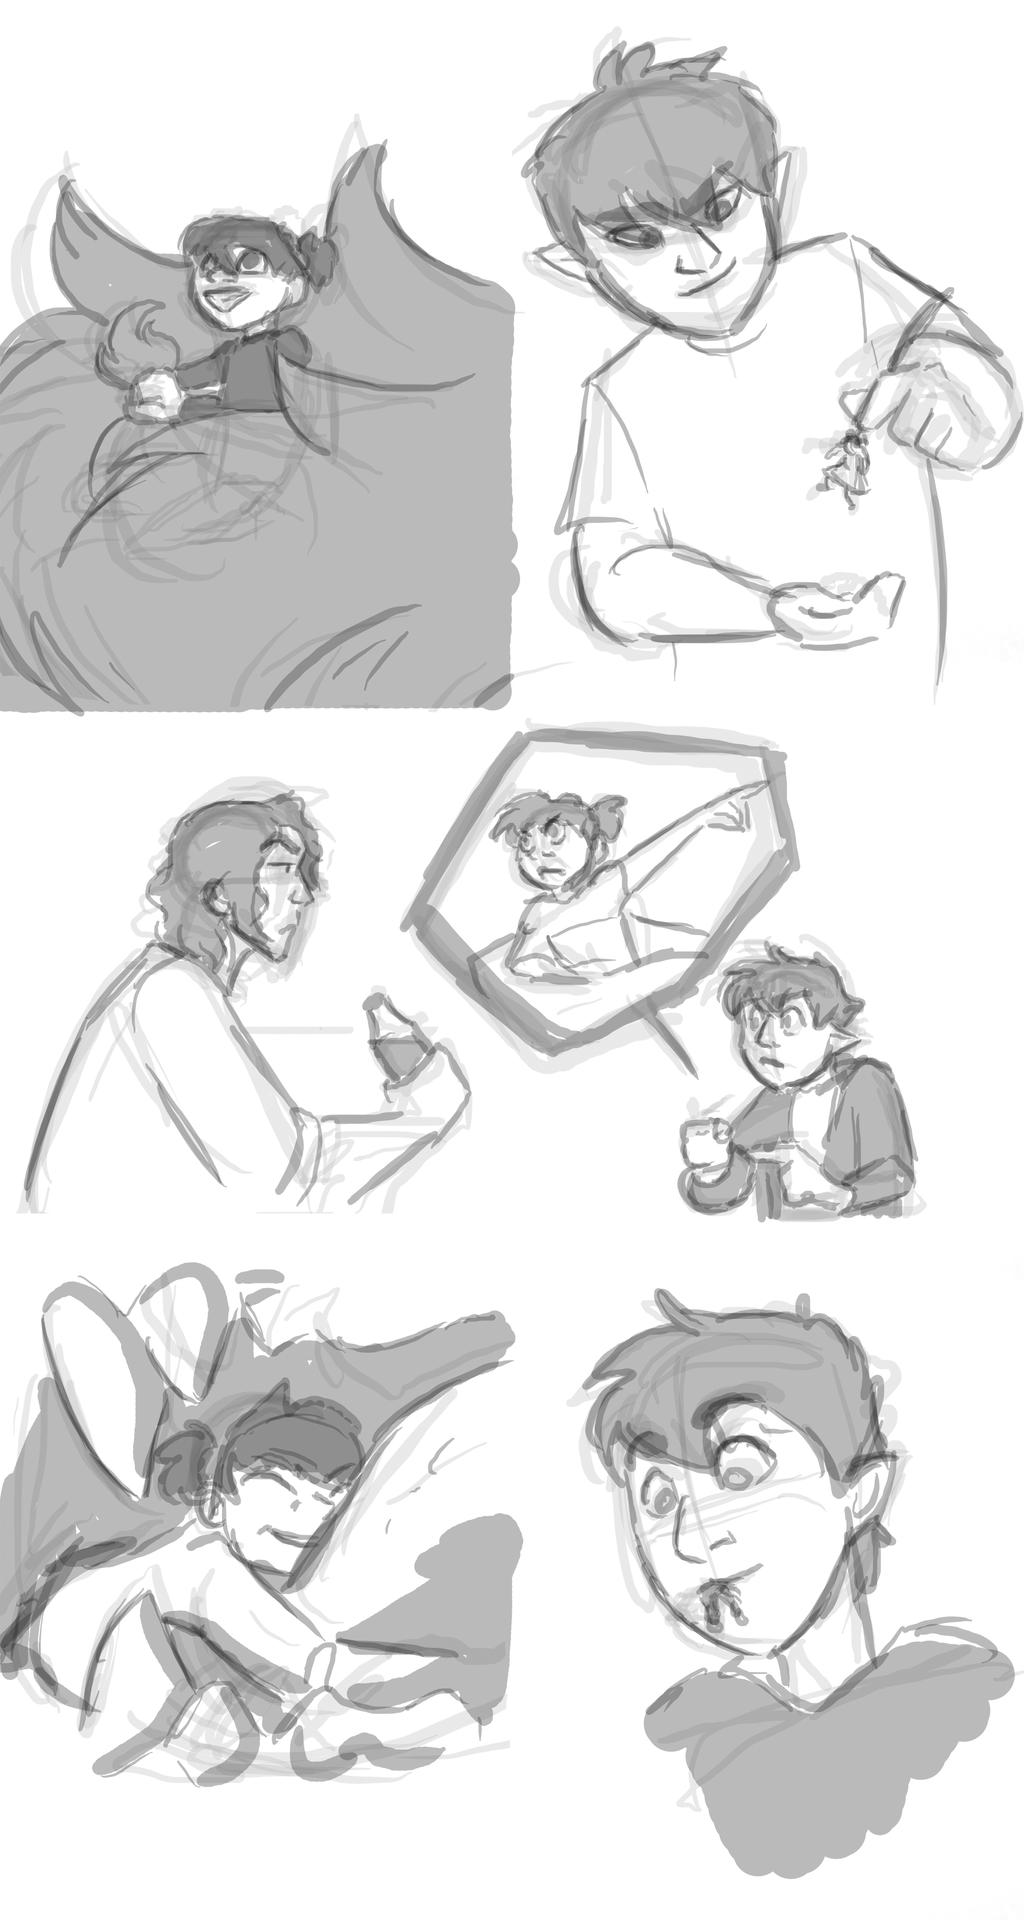 SketchPage|Kid!Killian+Mandy by mistress0minx